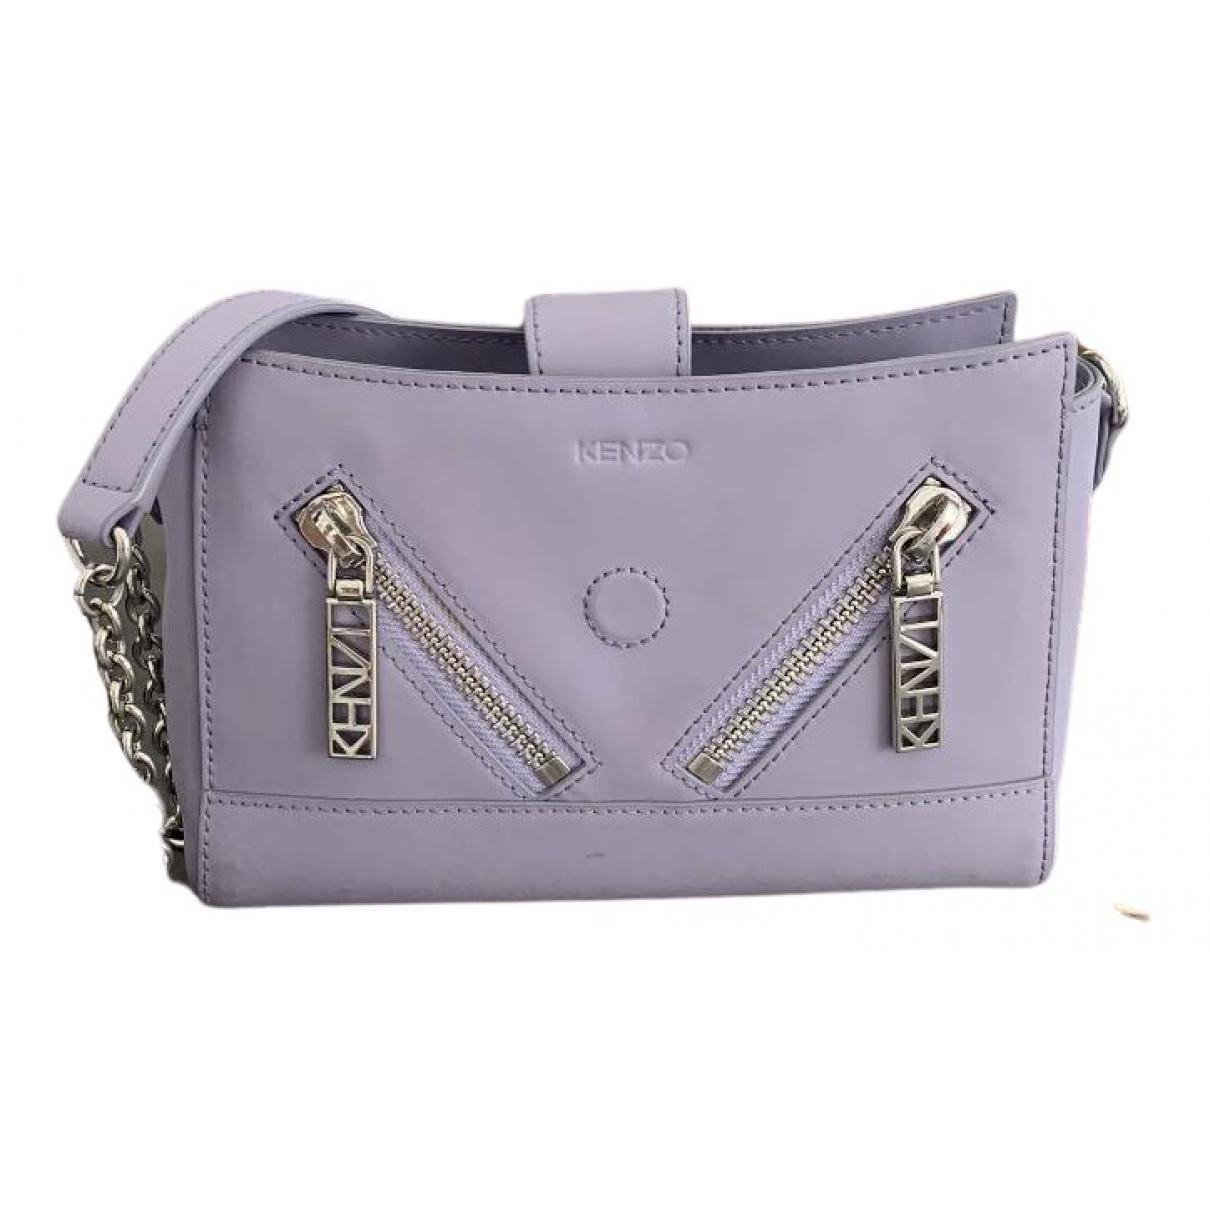 Kenzo \N Handtasche in  Lila Leder